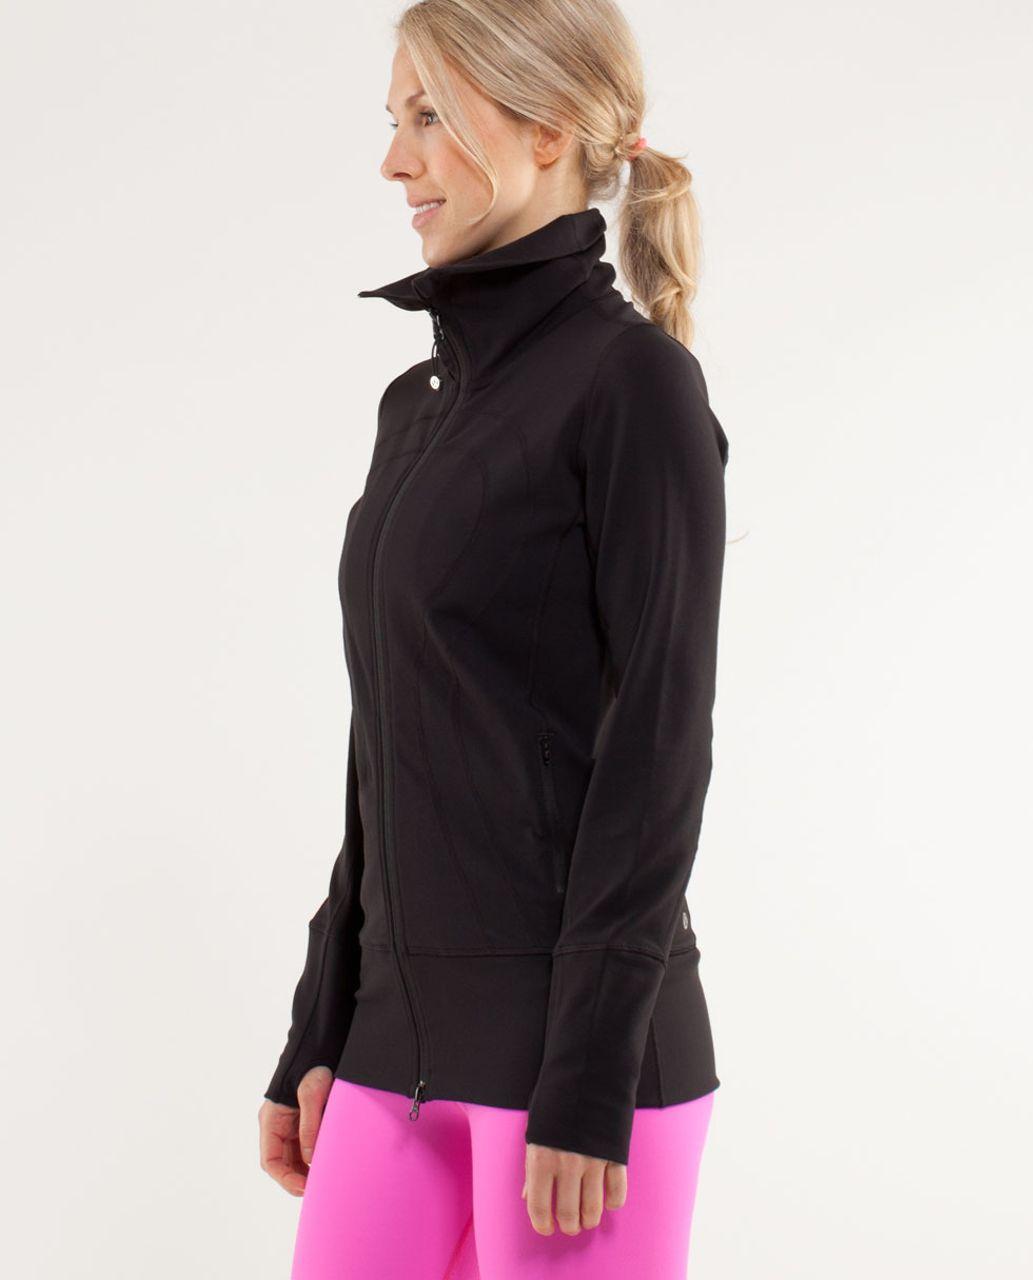 Lululemon In Stride Jacket - Black